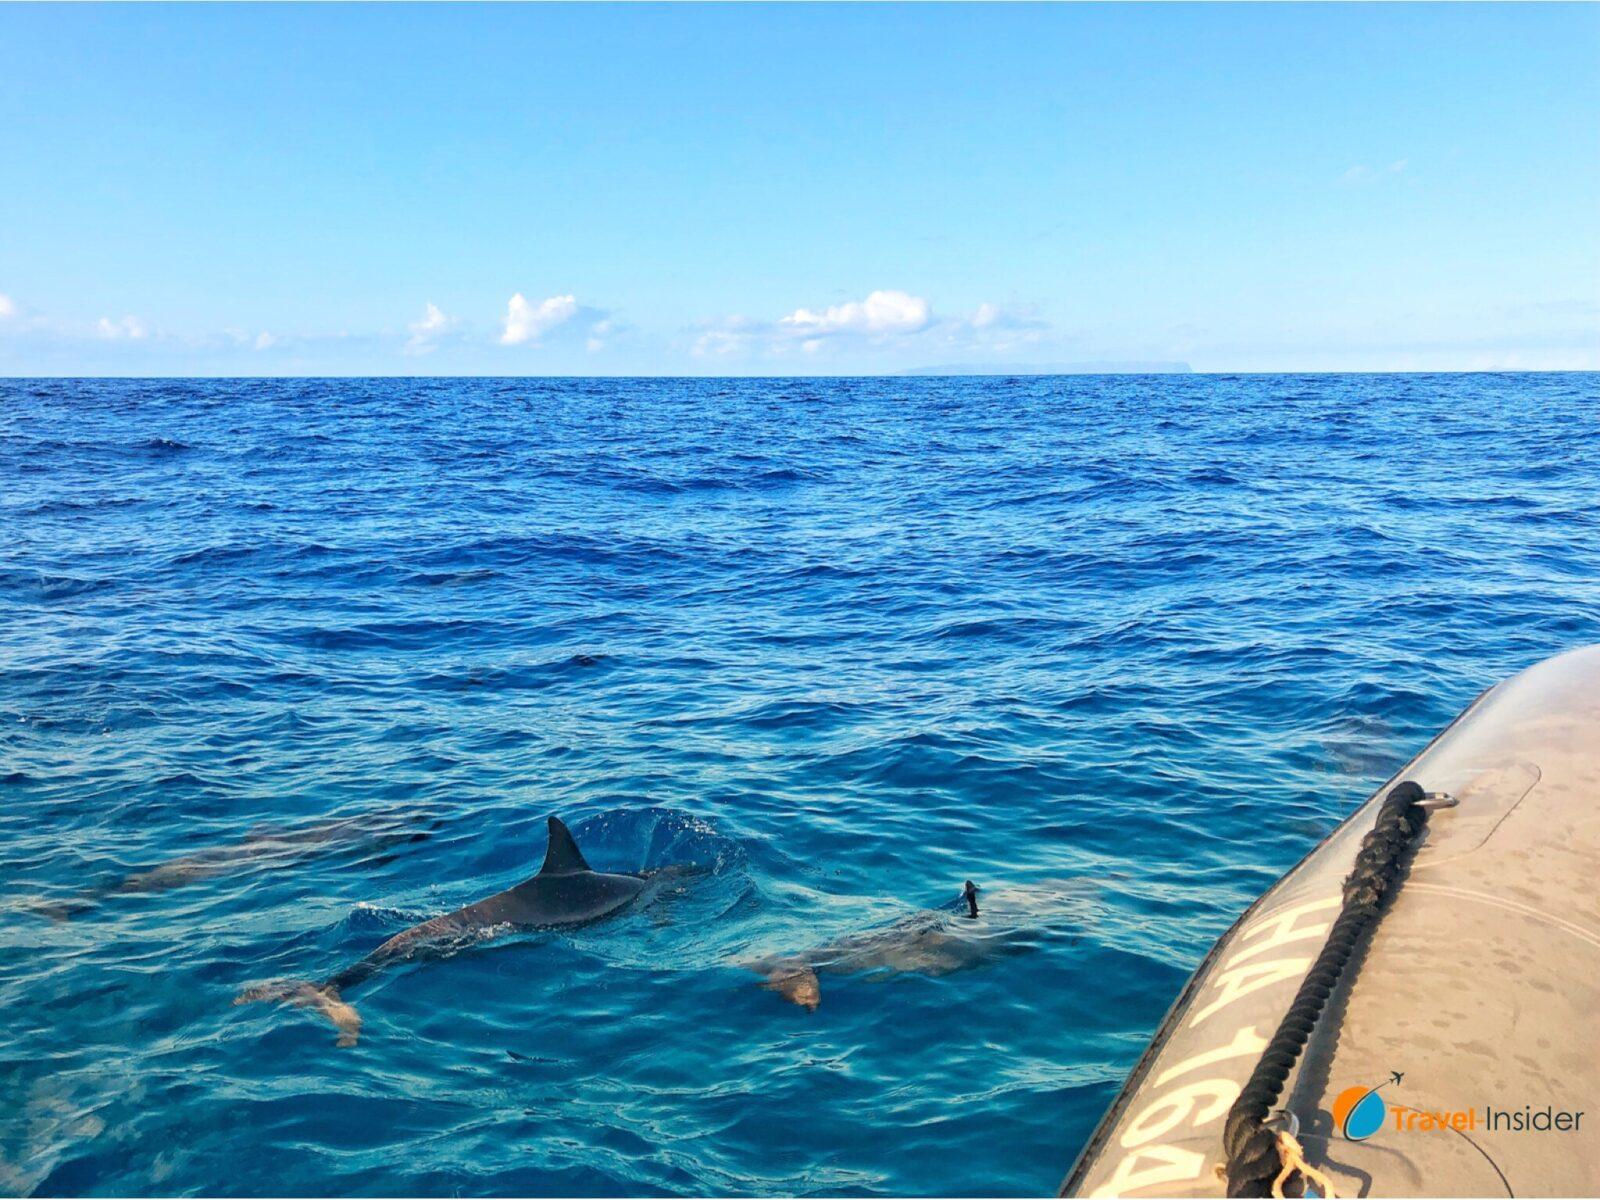 Delfine auf dem Weg zur Na Pali Coast